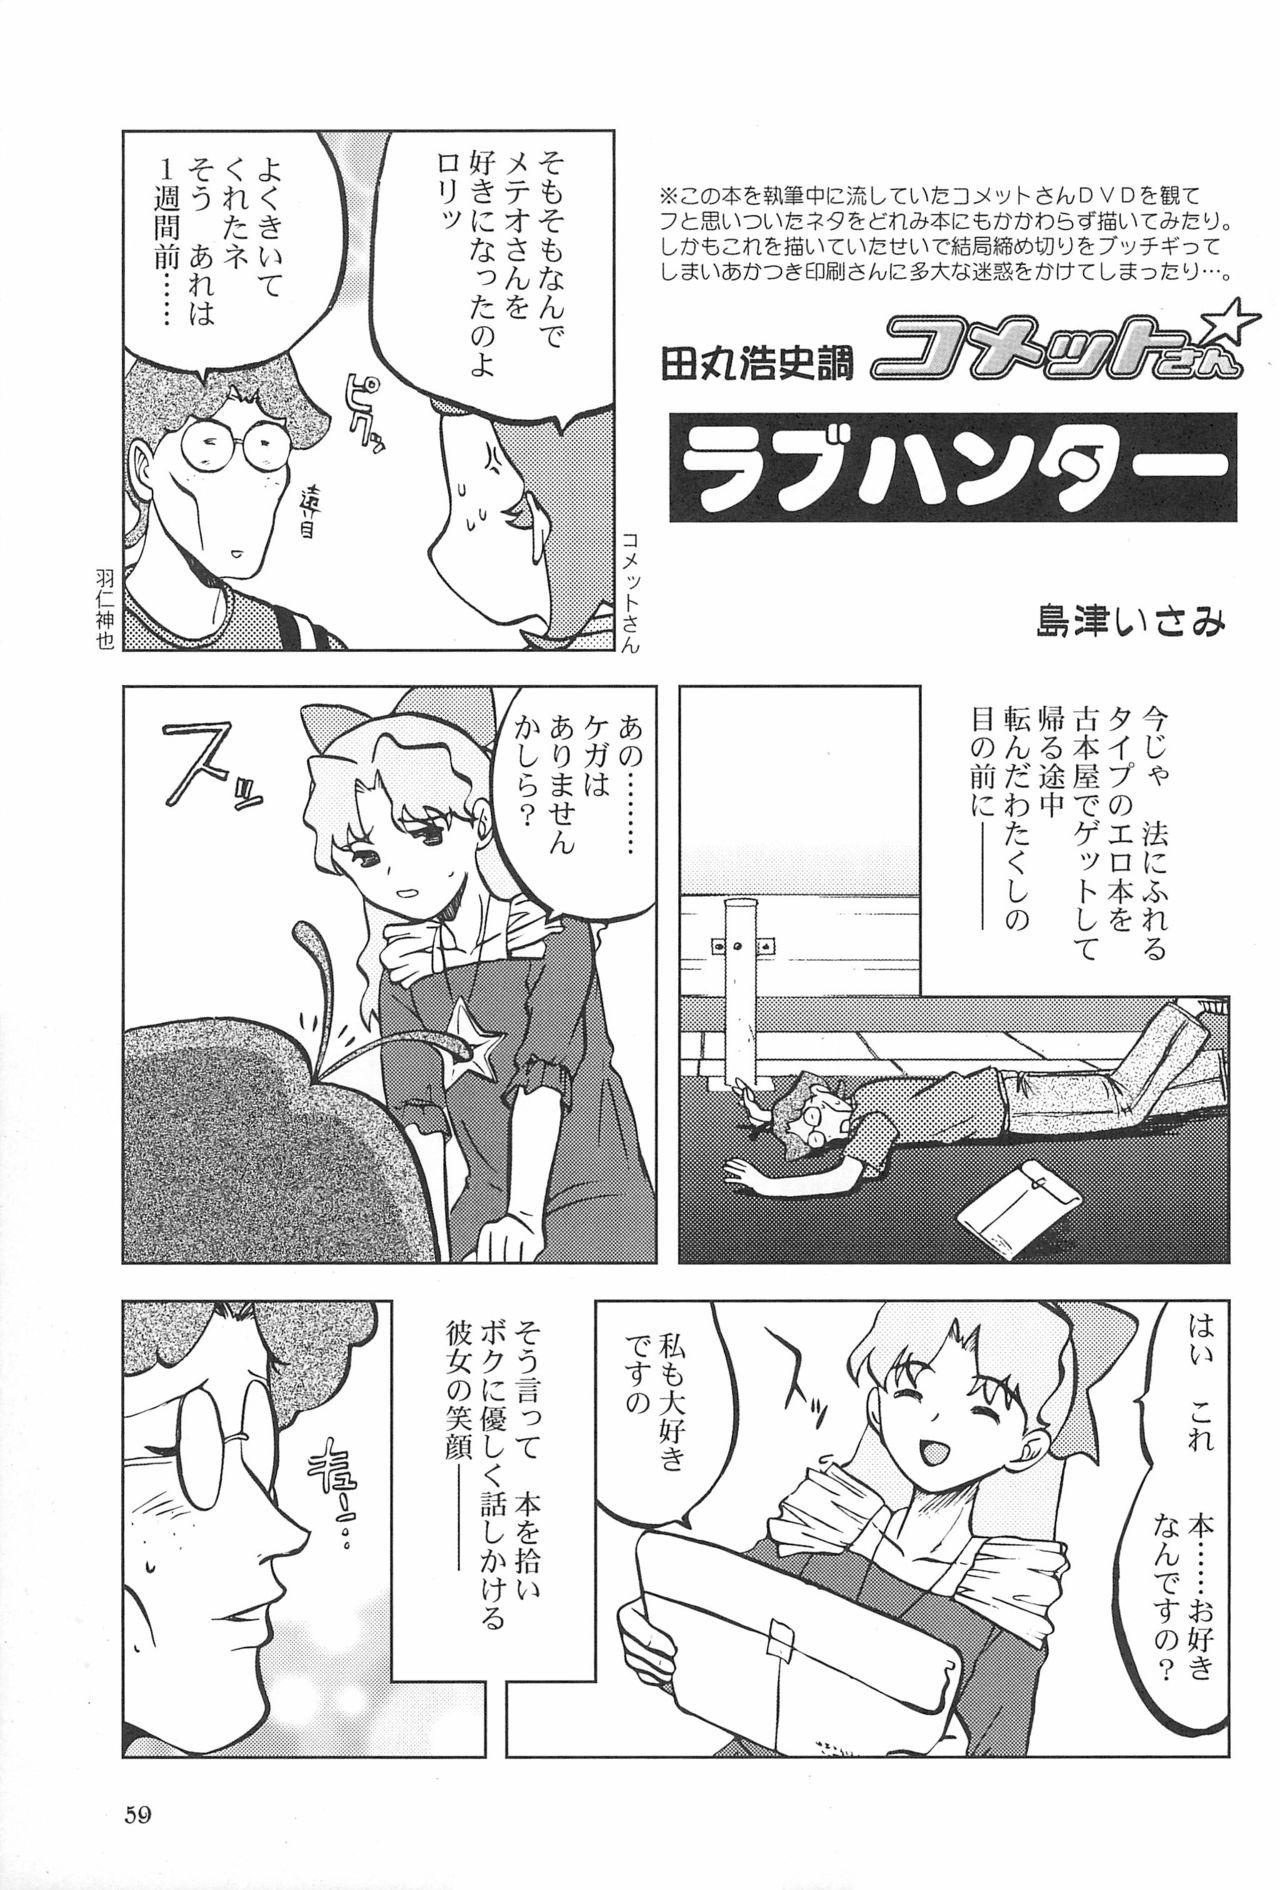 Momo no Kanzume 58